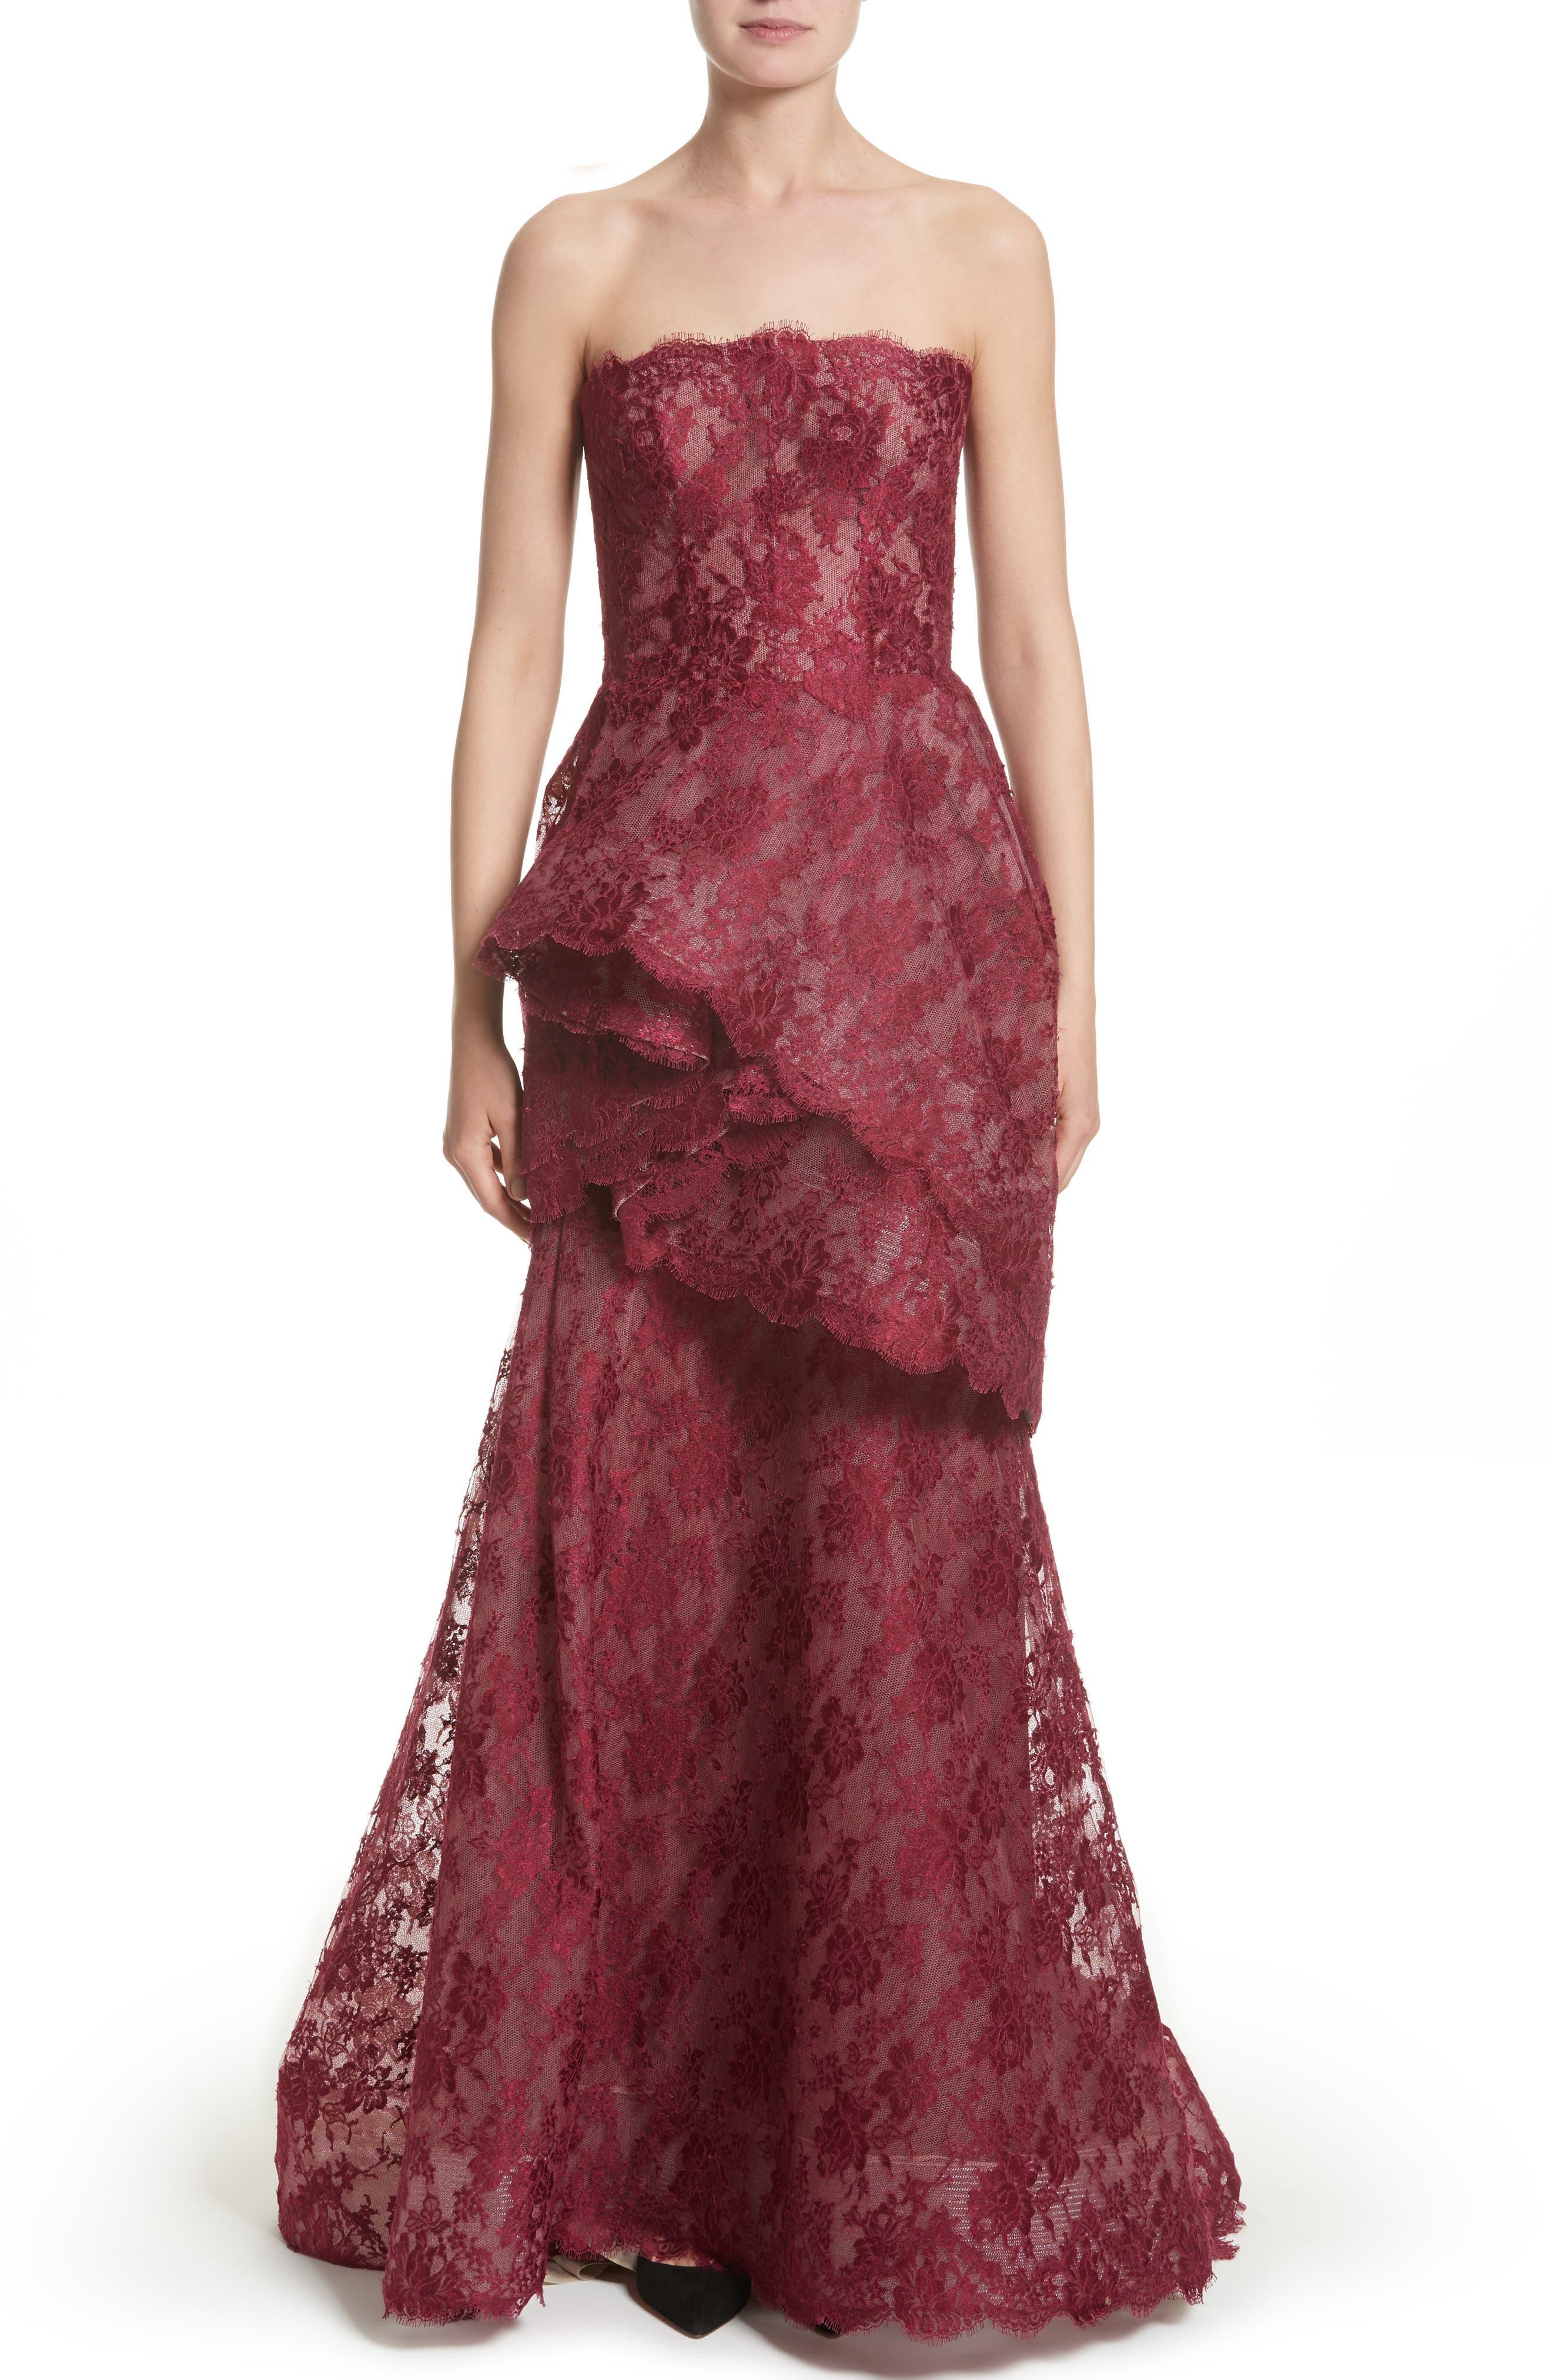 Monique Lhuillier Tiered Strapless Lace Gown